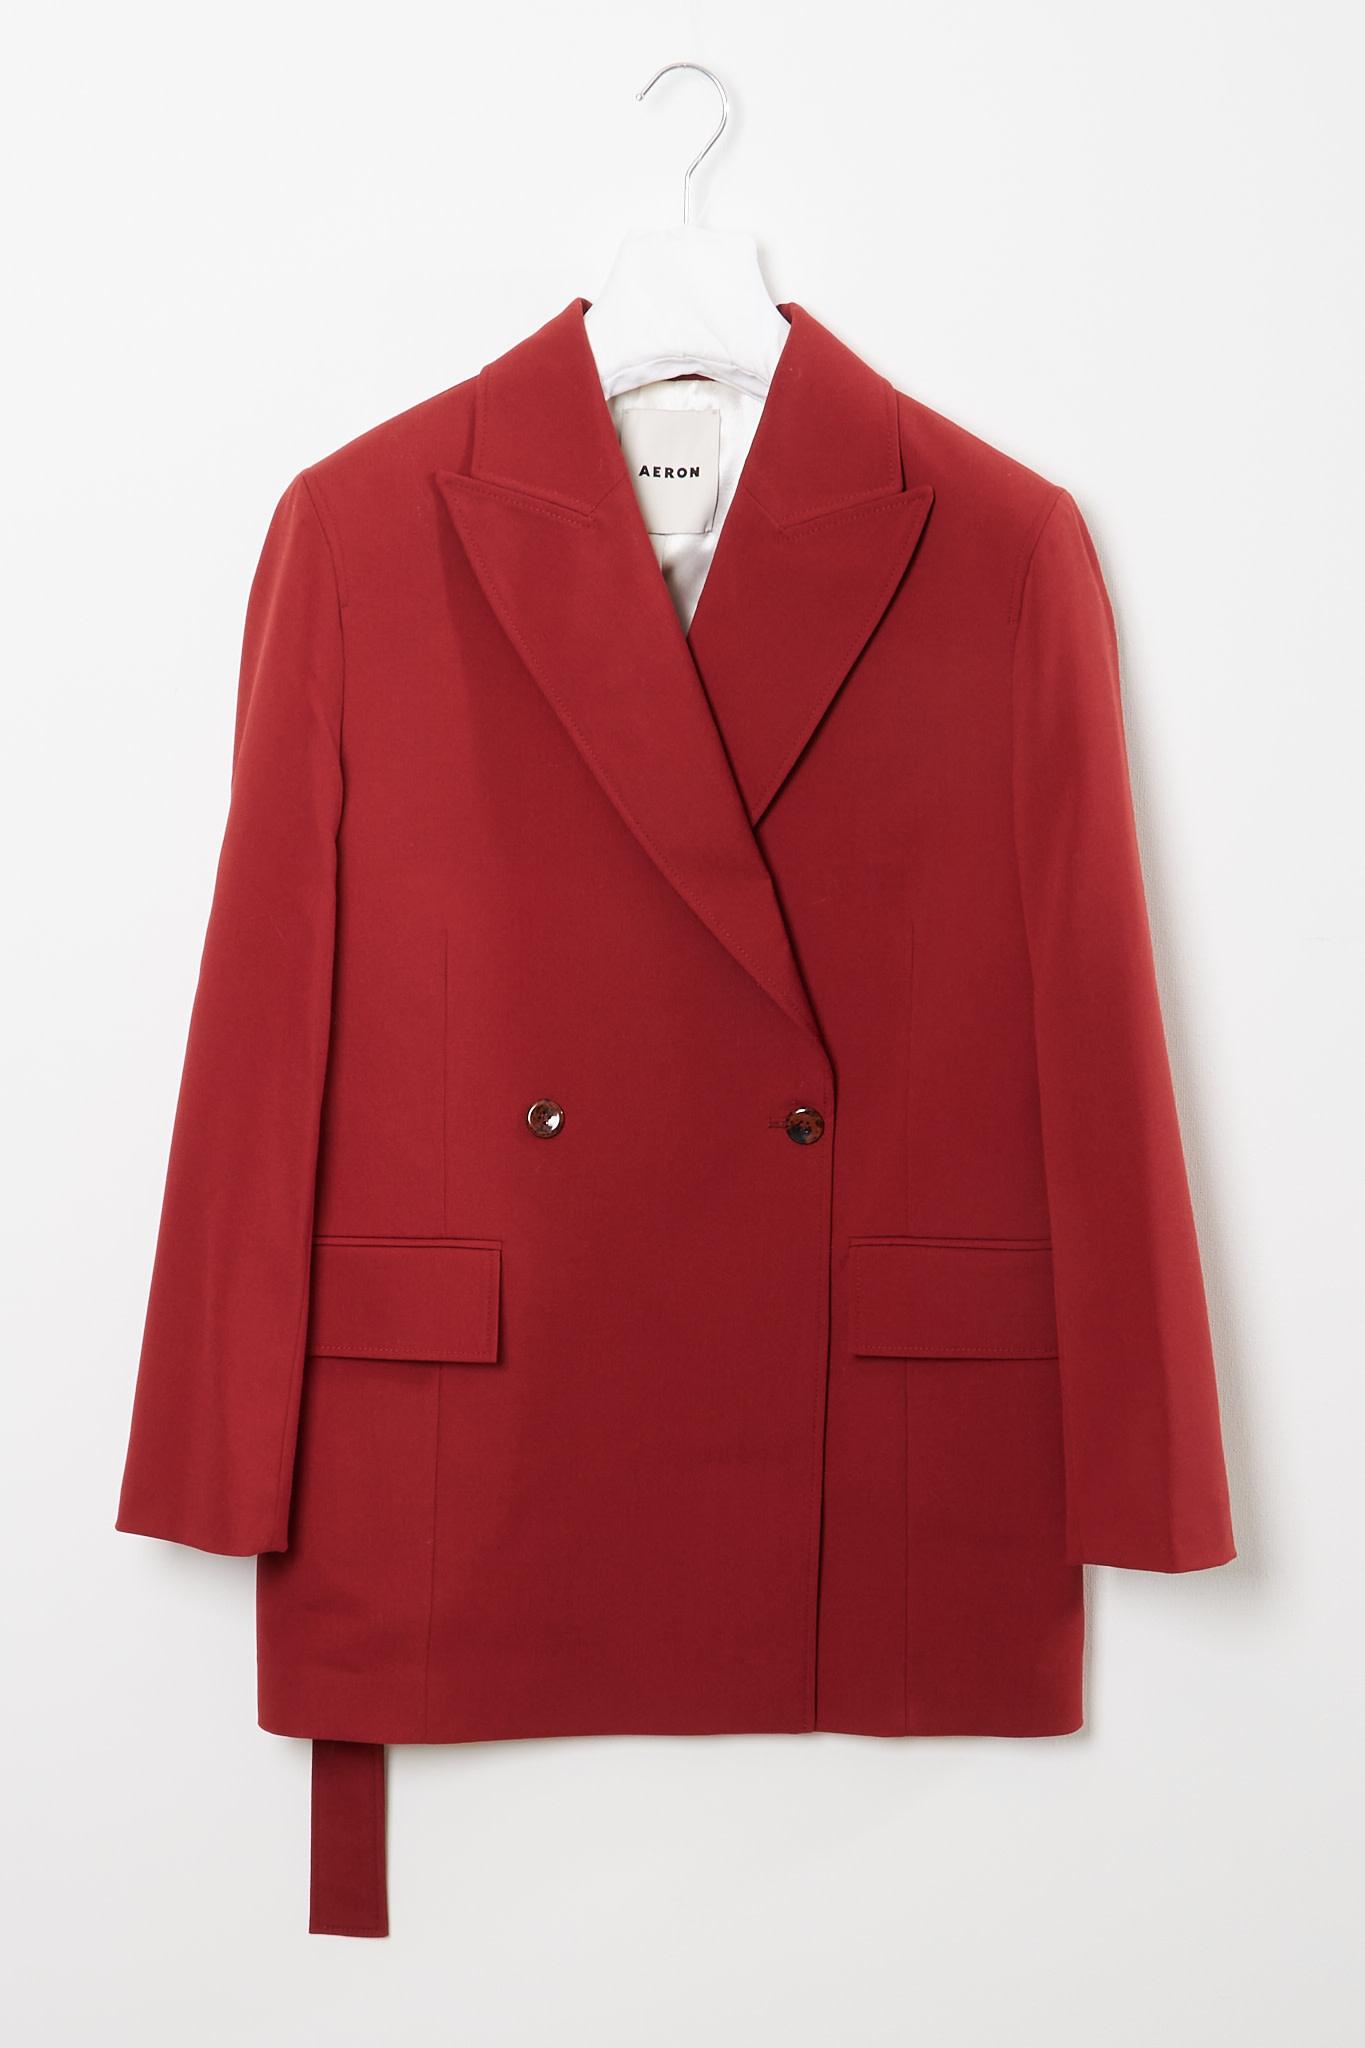 Aeron - Bianca recycled suiting  blazer